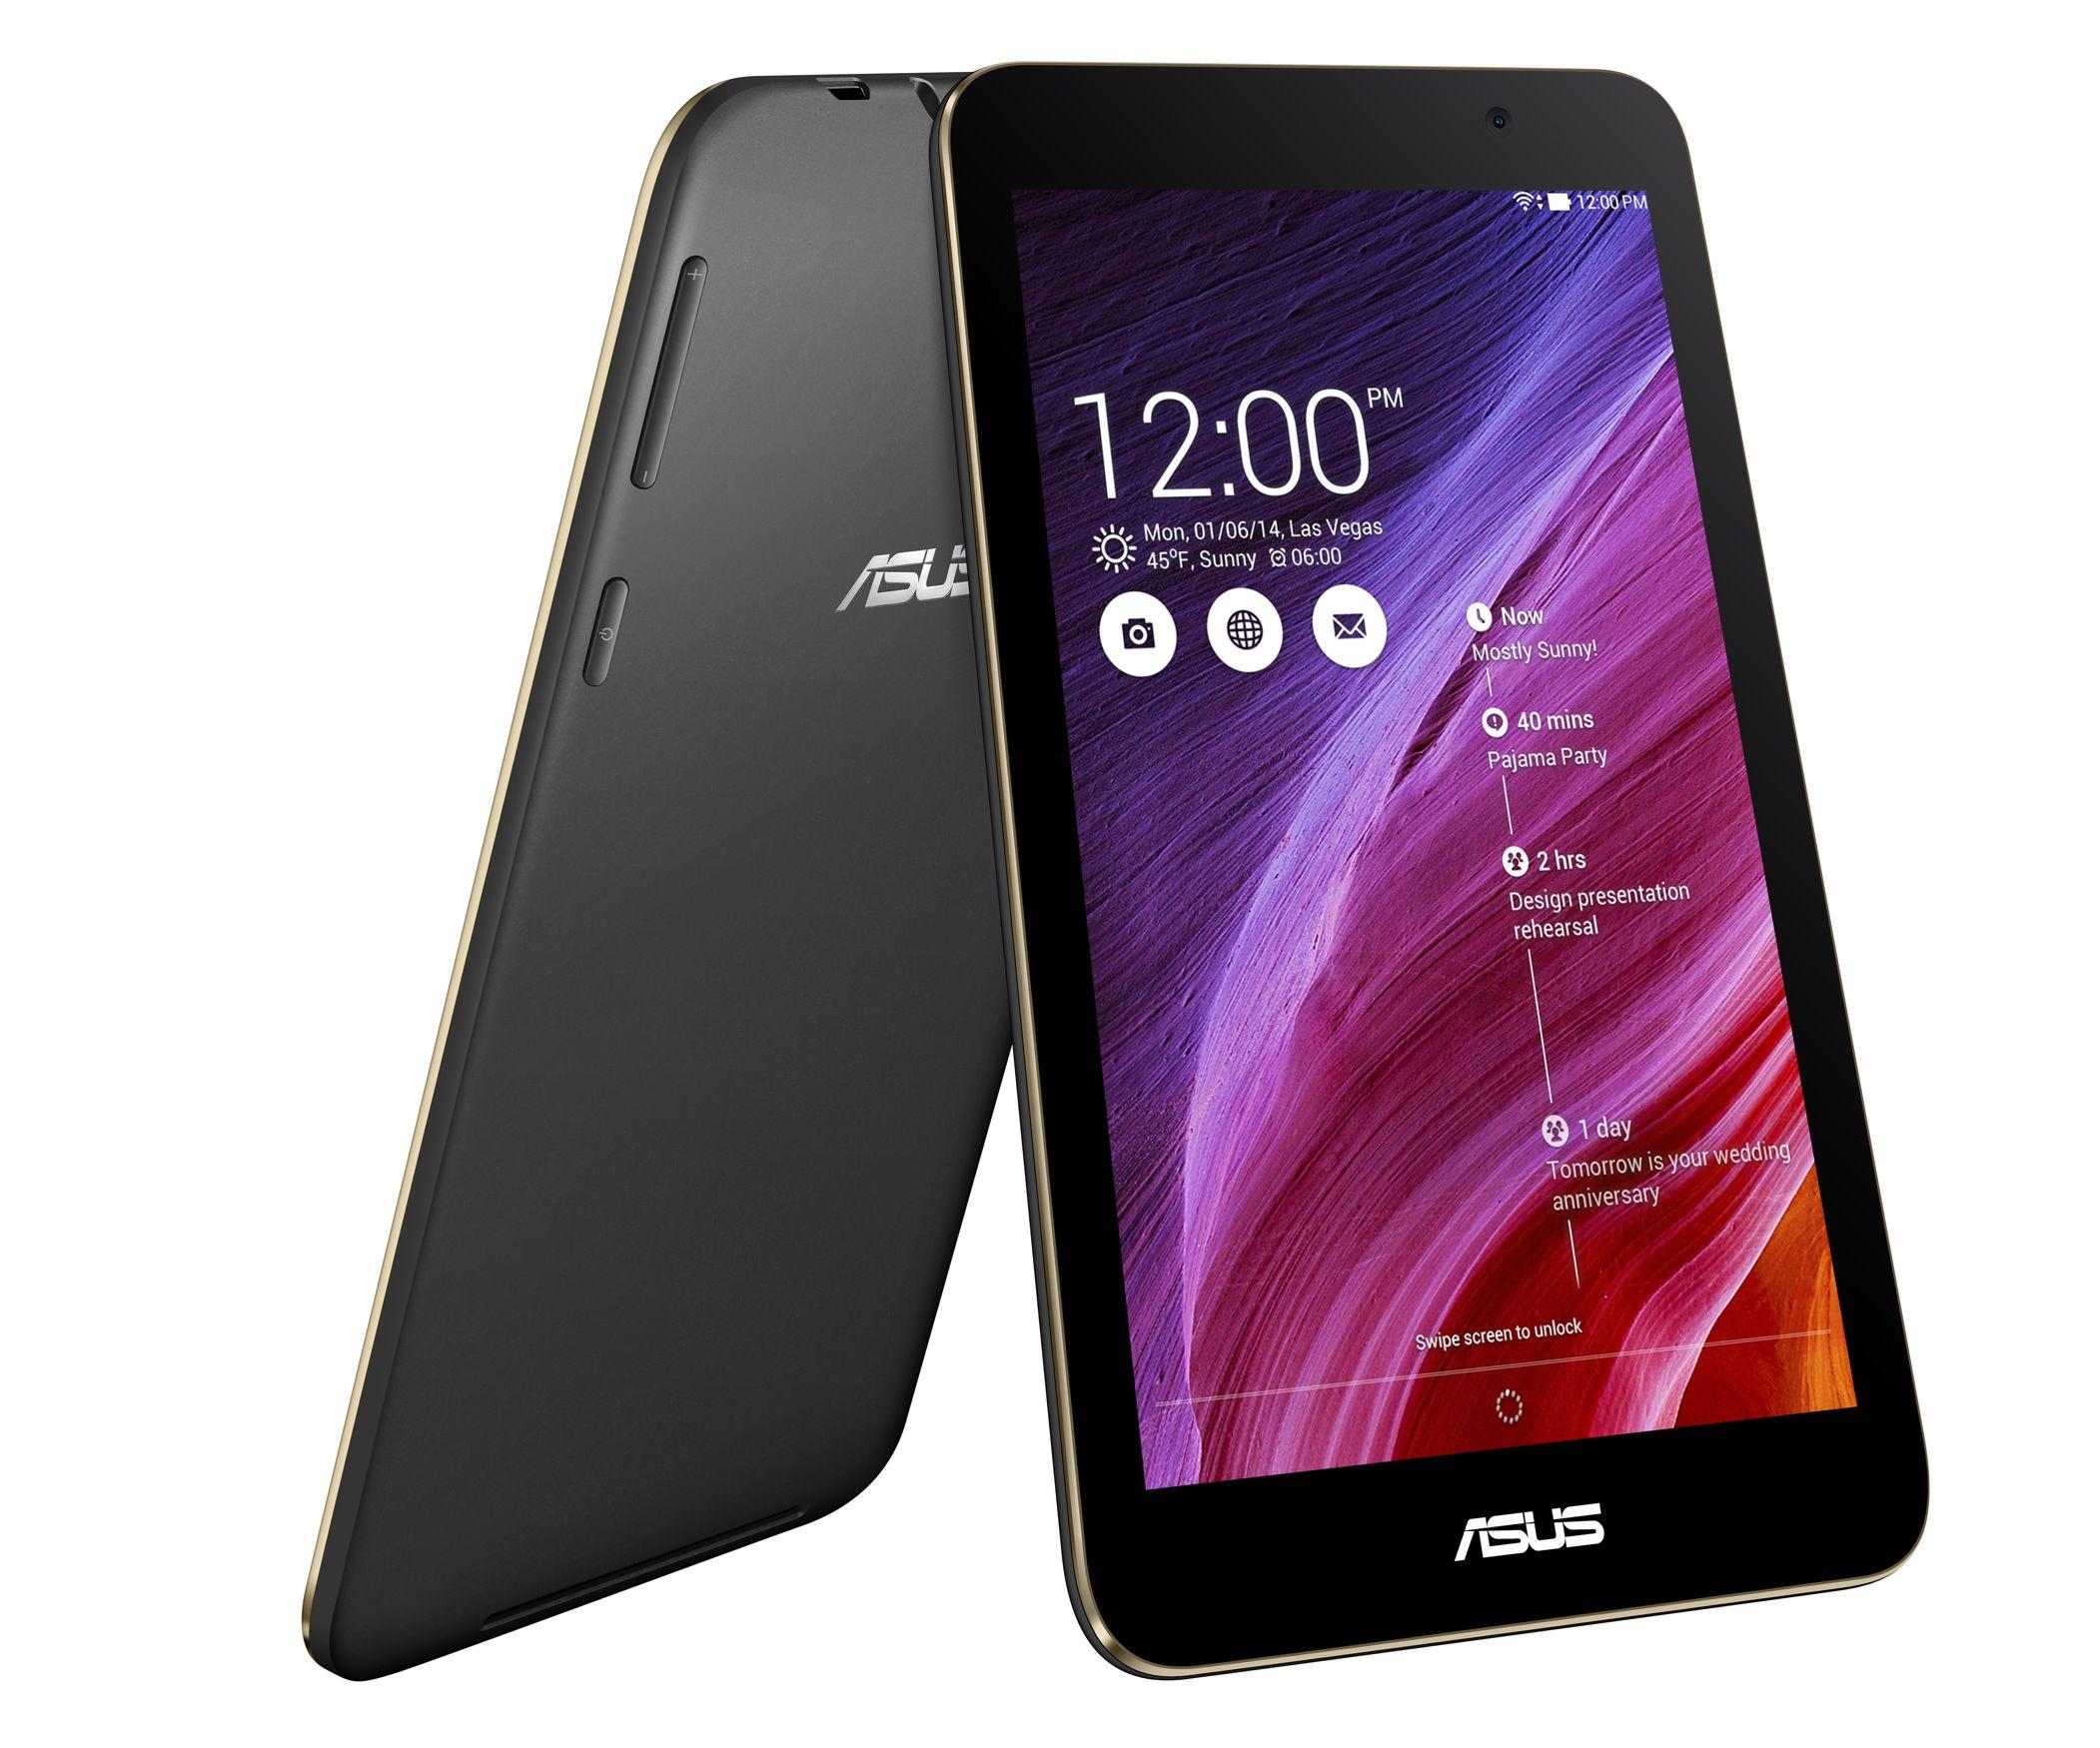 ASUS MeMO Pad™ 7 /Z3745/16G/1GB/Android 4.4 čierny